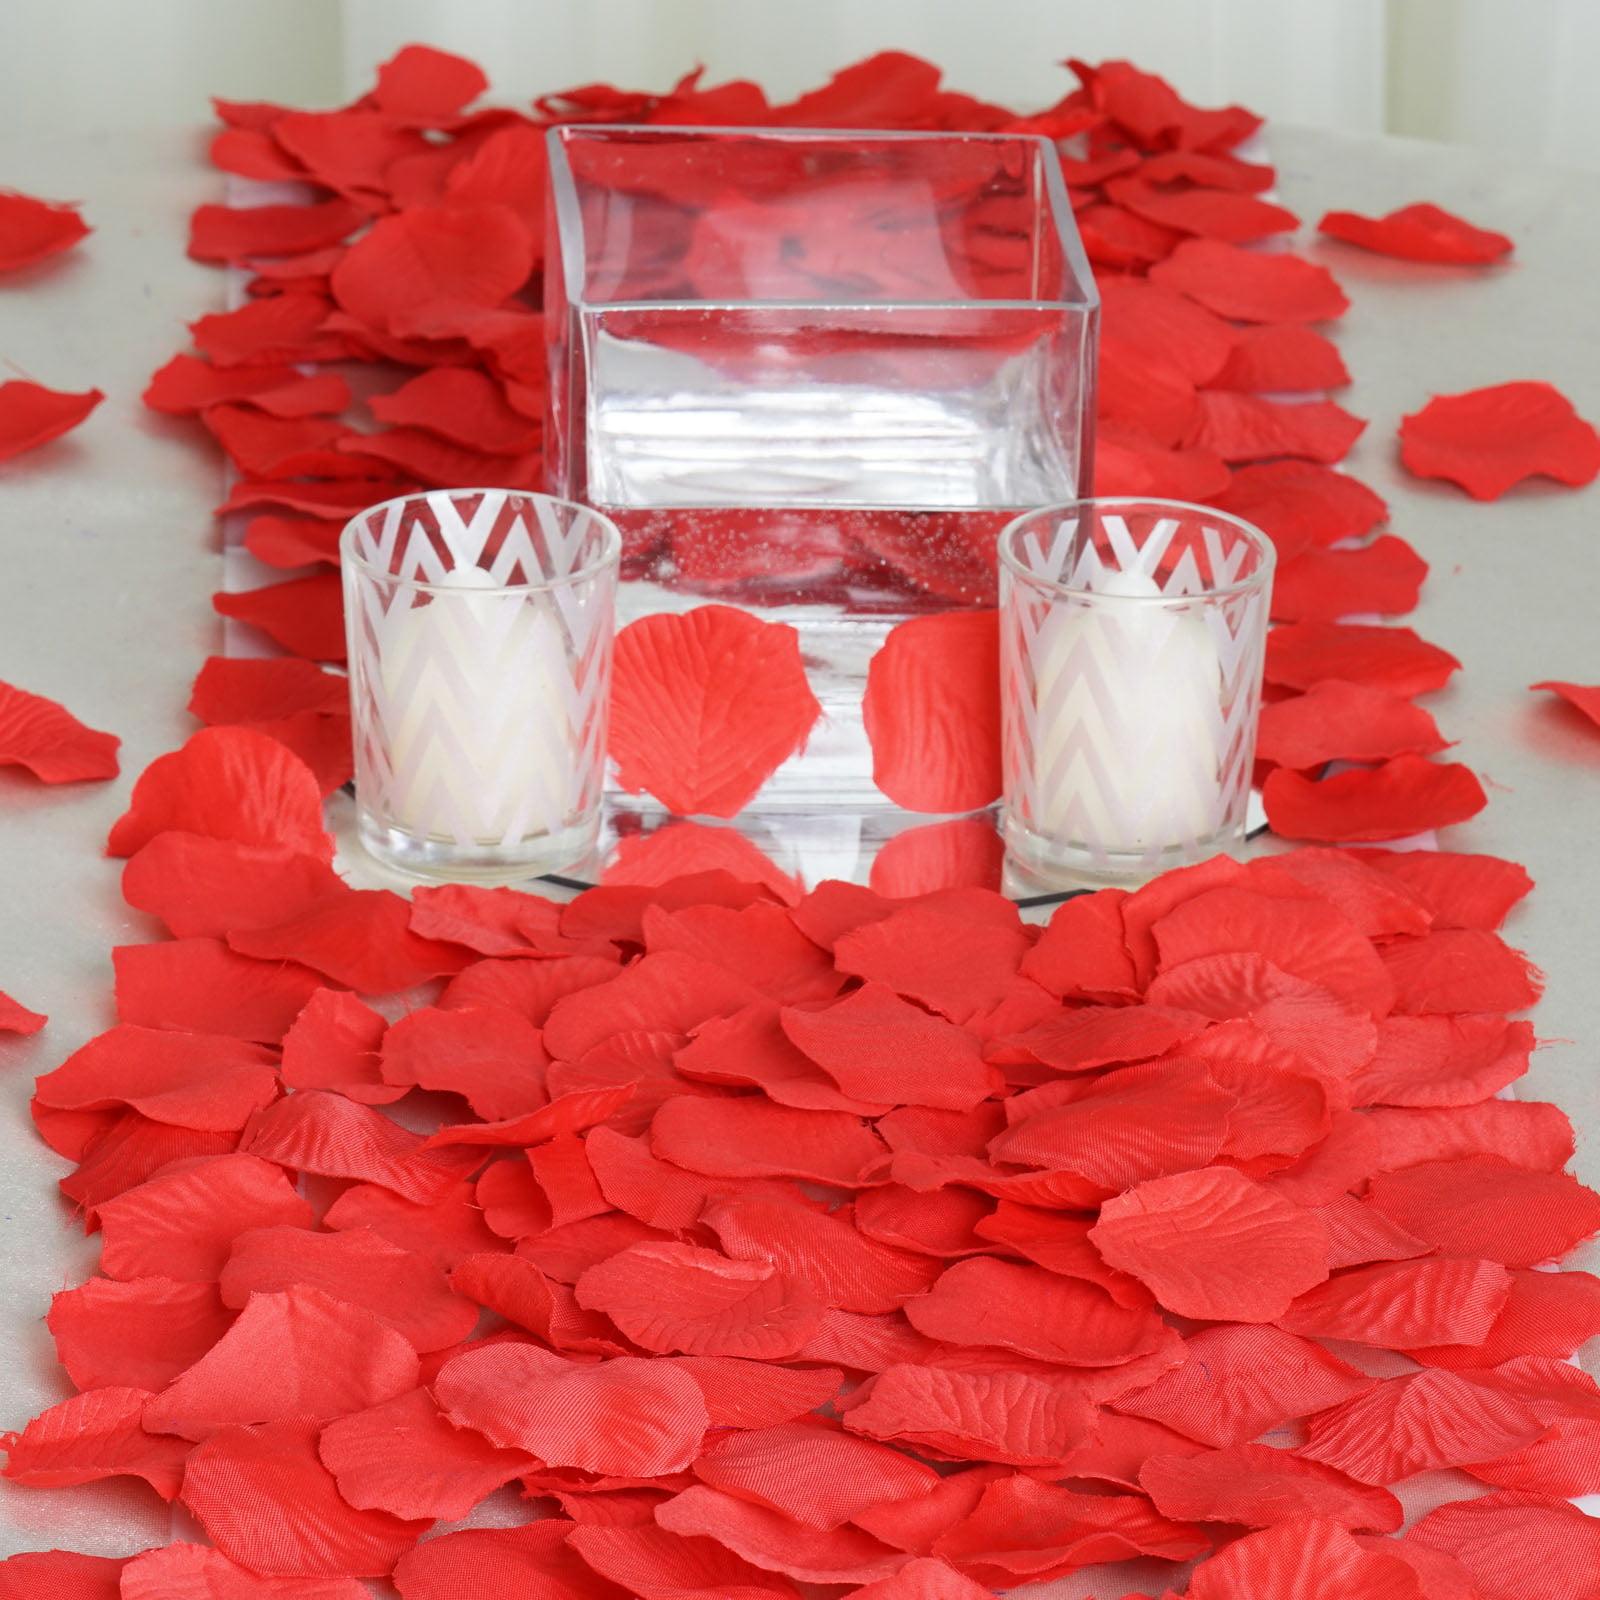 BalsaCircle 500 Silk Rose Petals Wedding Decorations Bulk ...   450 x 450 jpeg 43kB